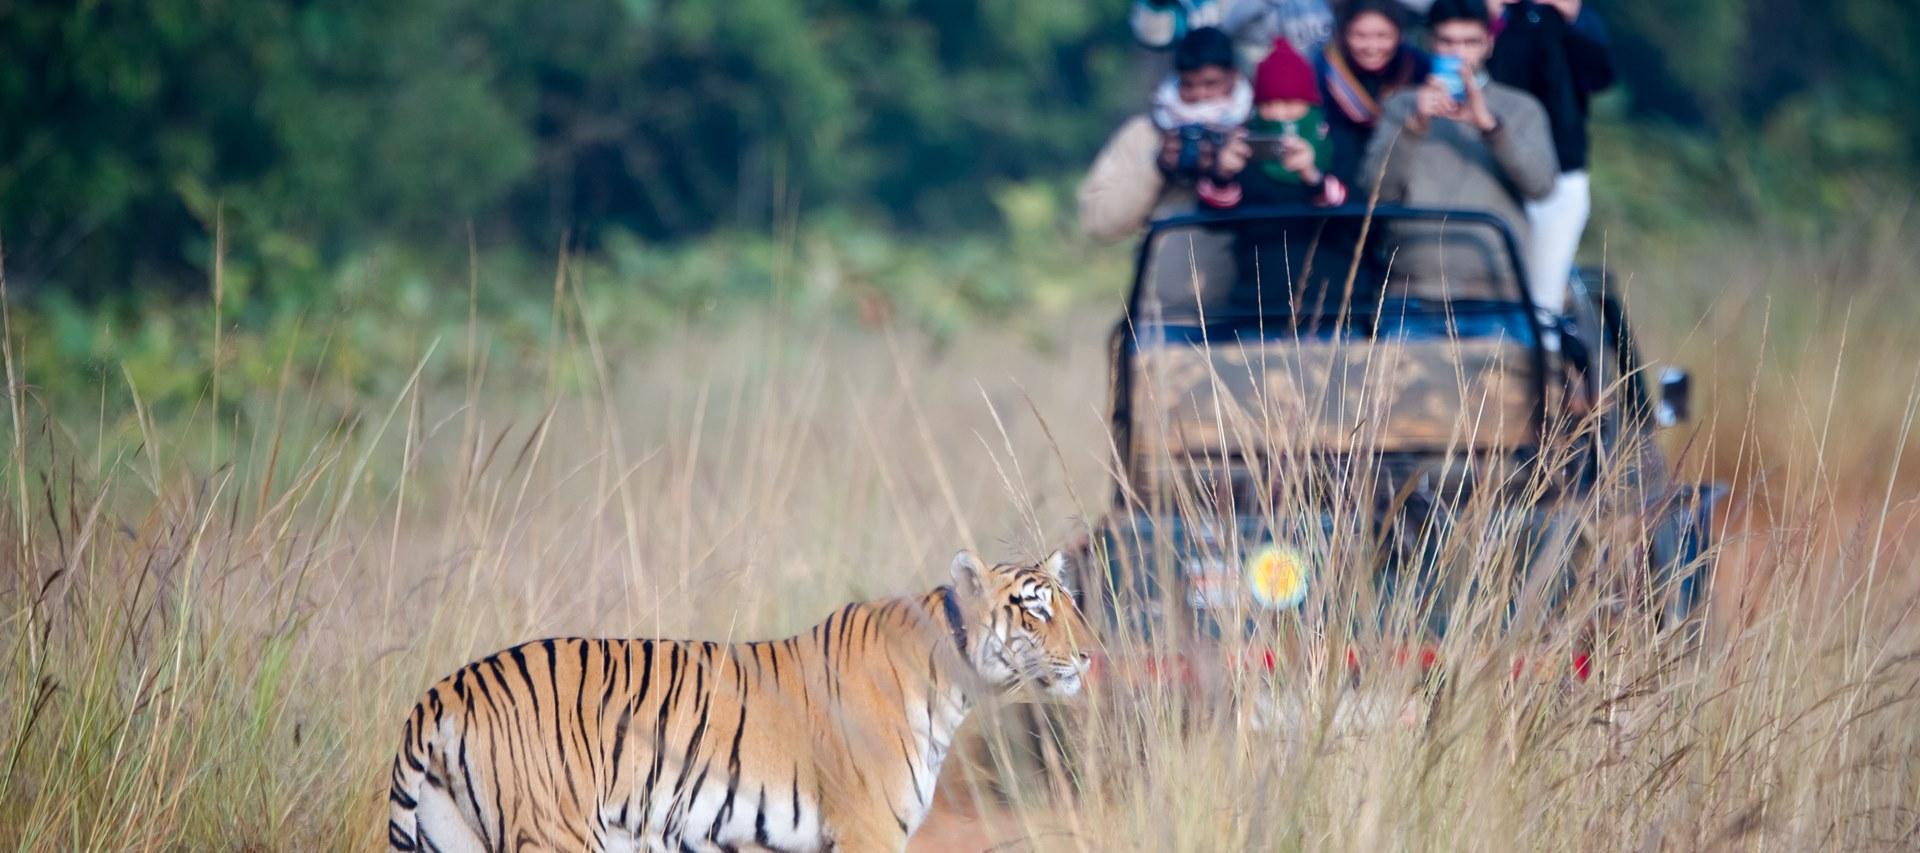 Tadoba jungle safari, Tadoba national park packages, Best Time to Visit Tadoba